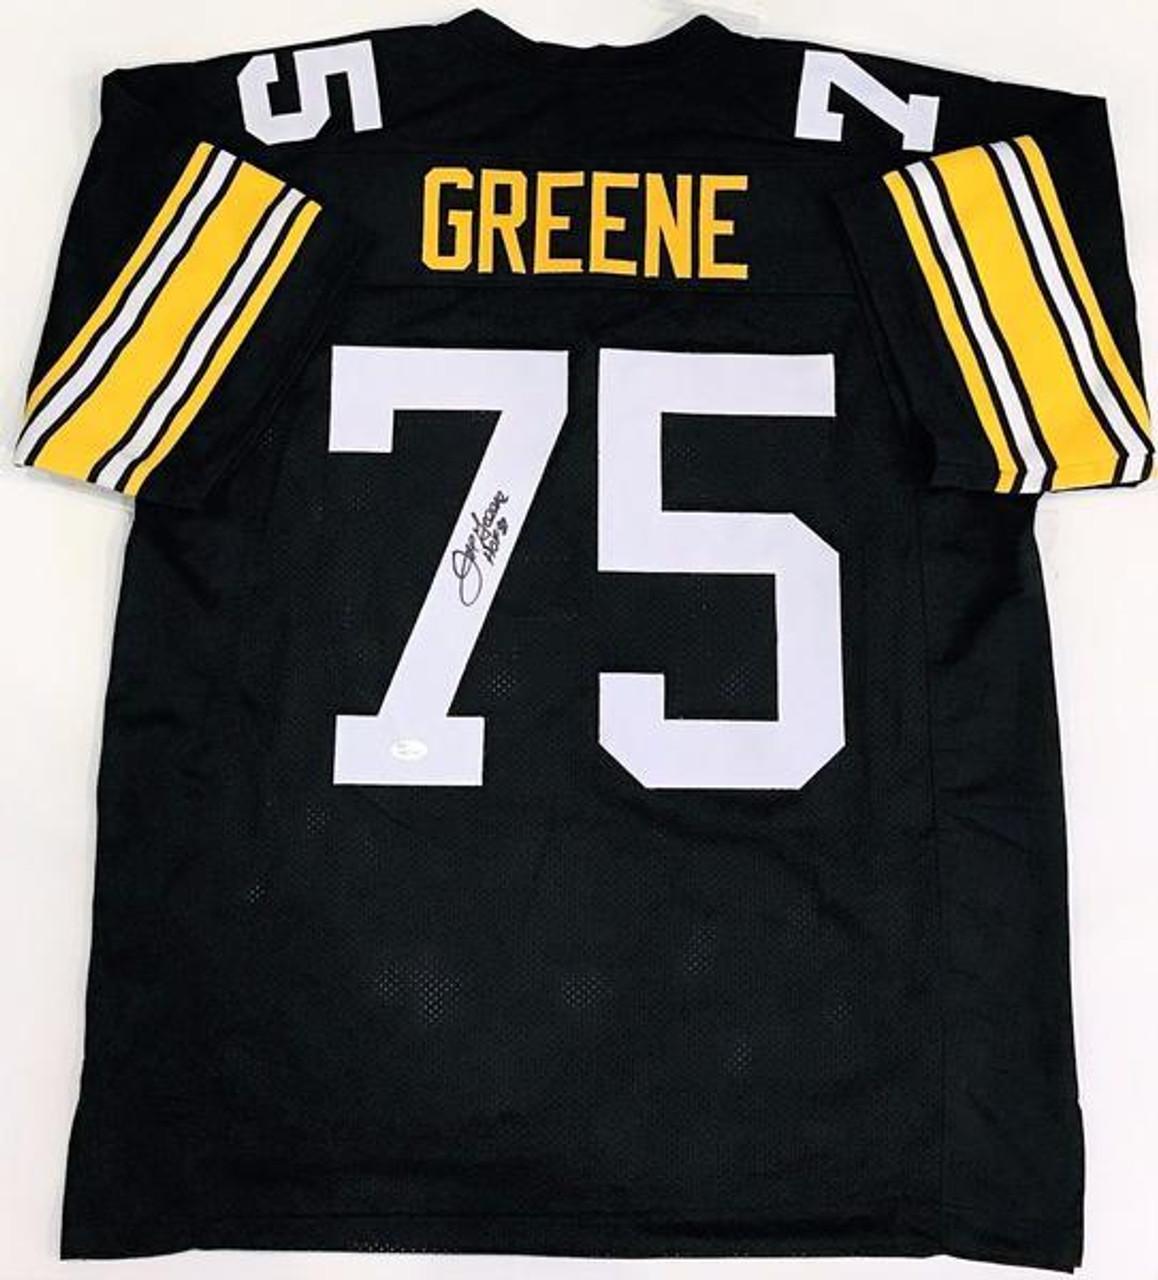 Mean Joe Greene Pittsburgh Steelers Autographed NFL Custom Football jersey